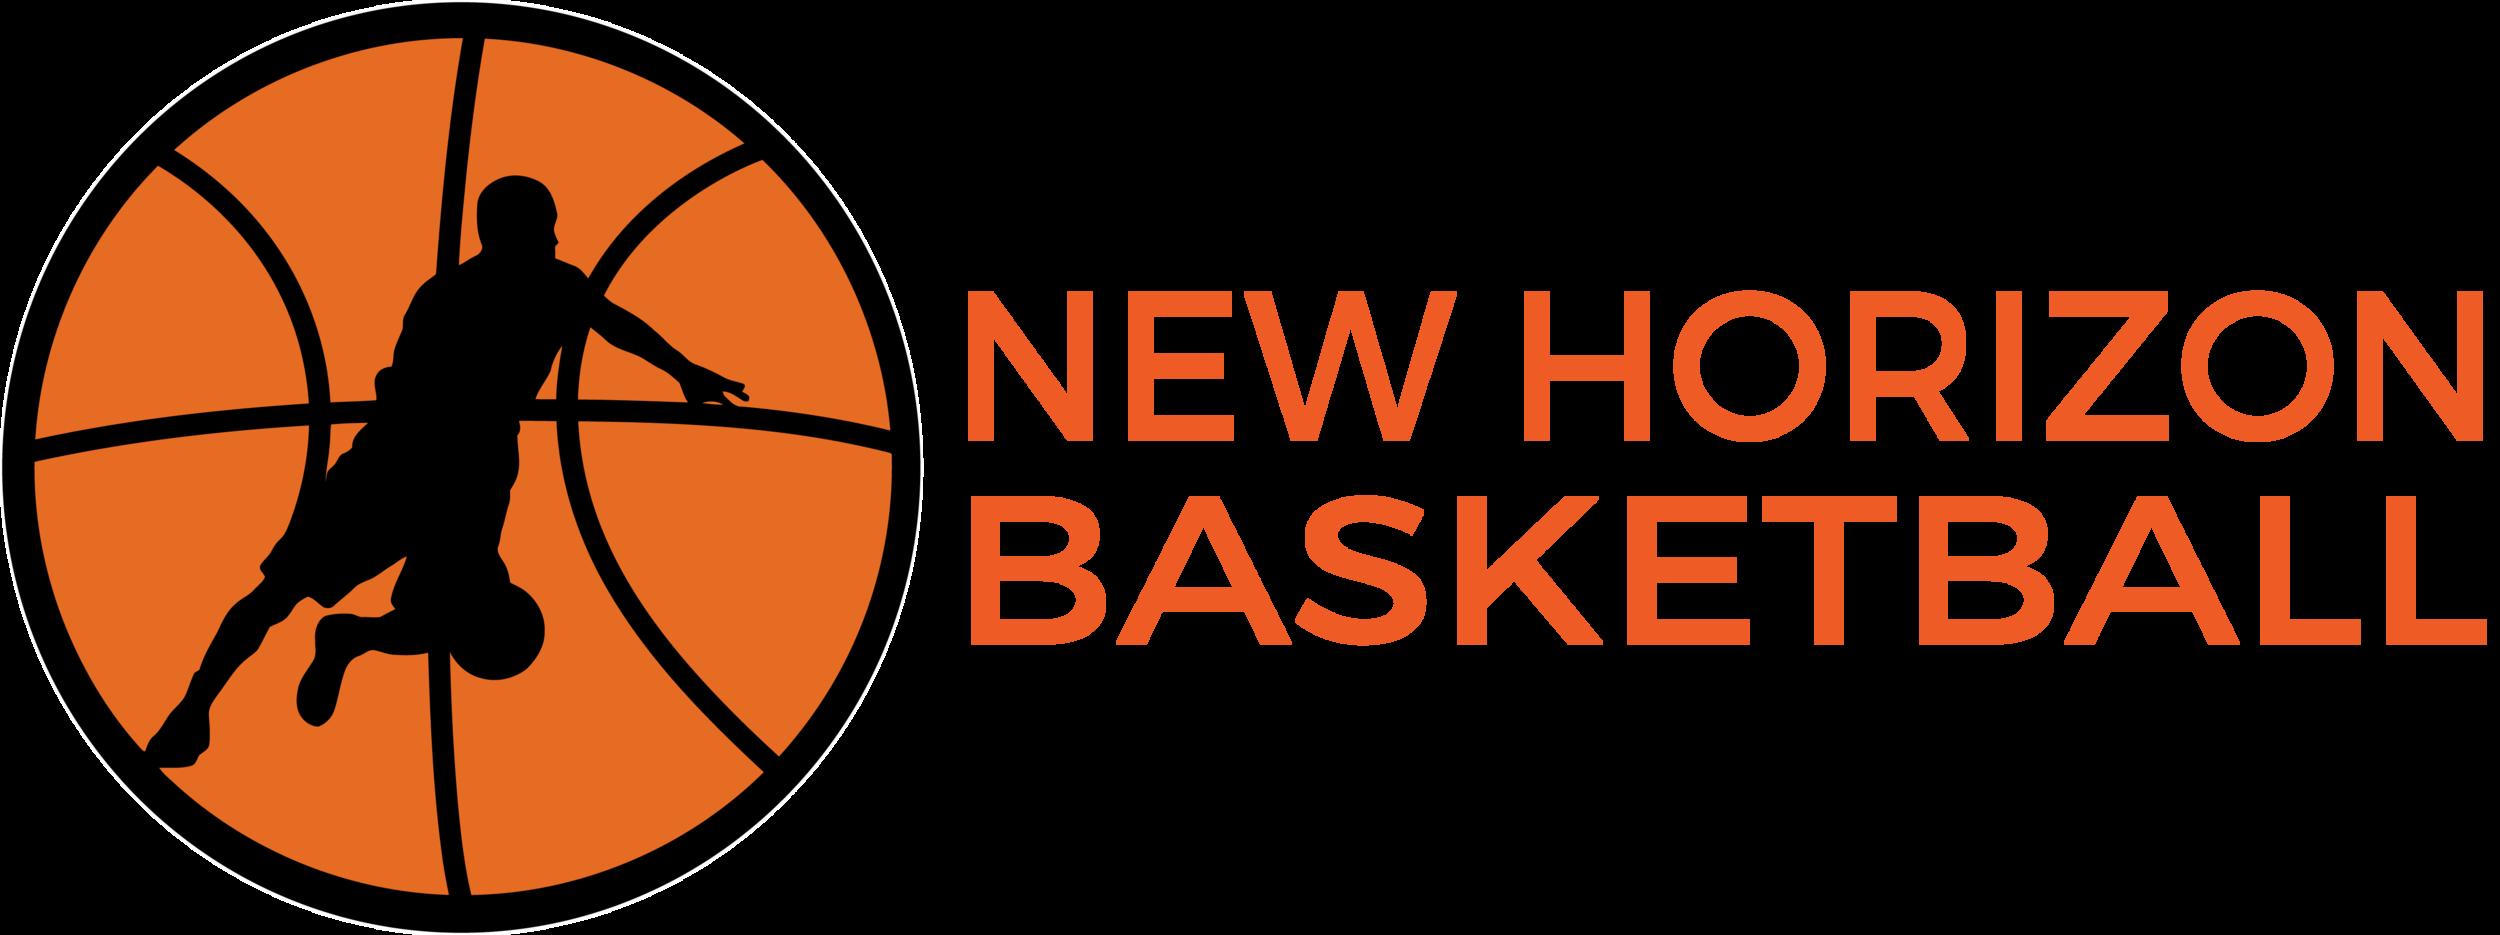 New Horizon Basketball